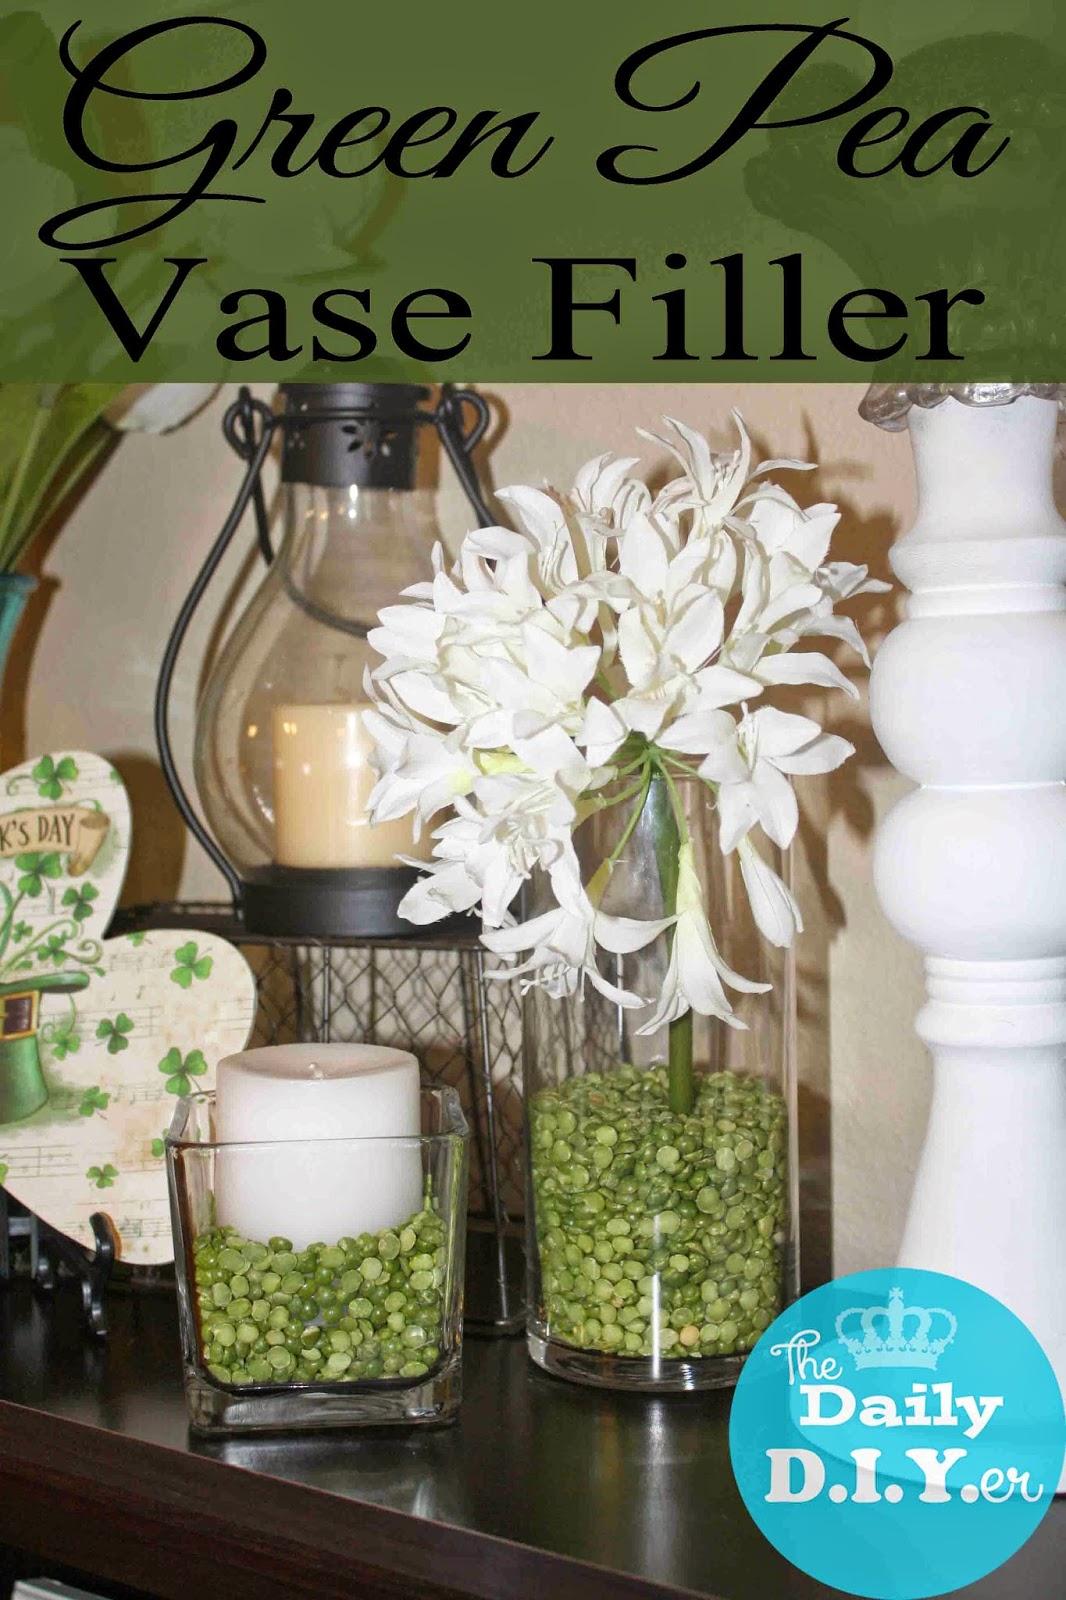 The daily diyer st patricks day vase filler reviewsmspy